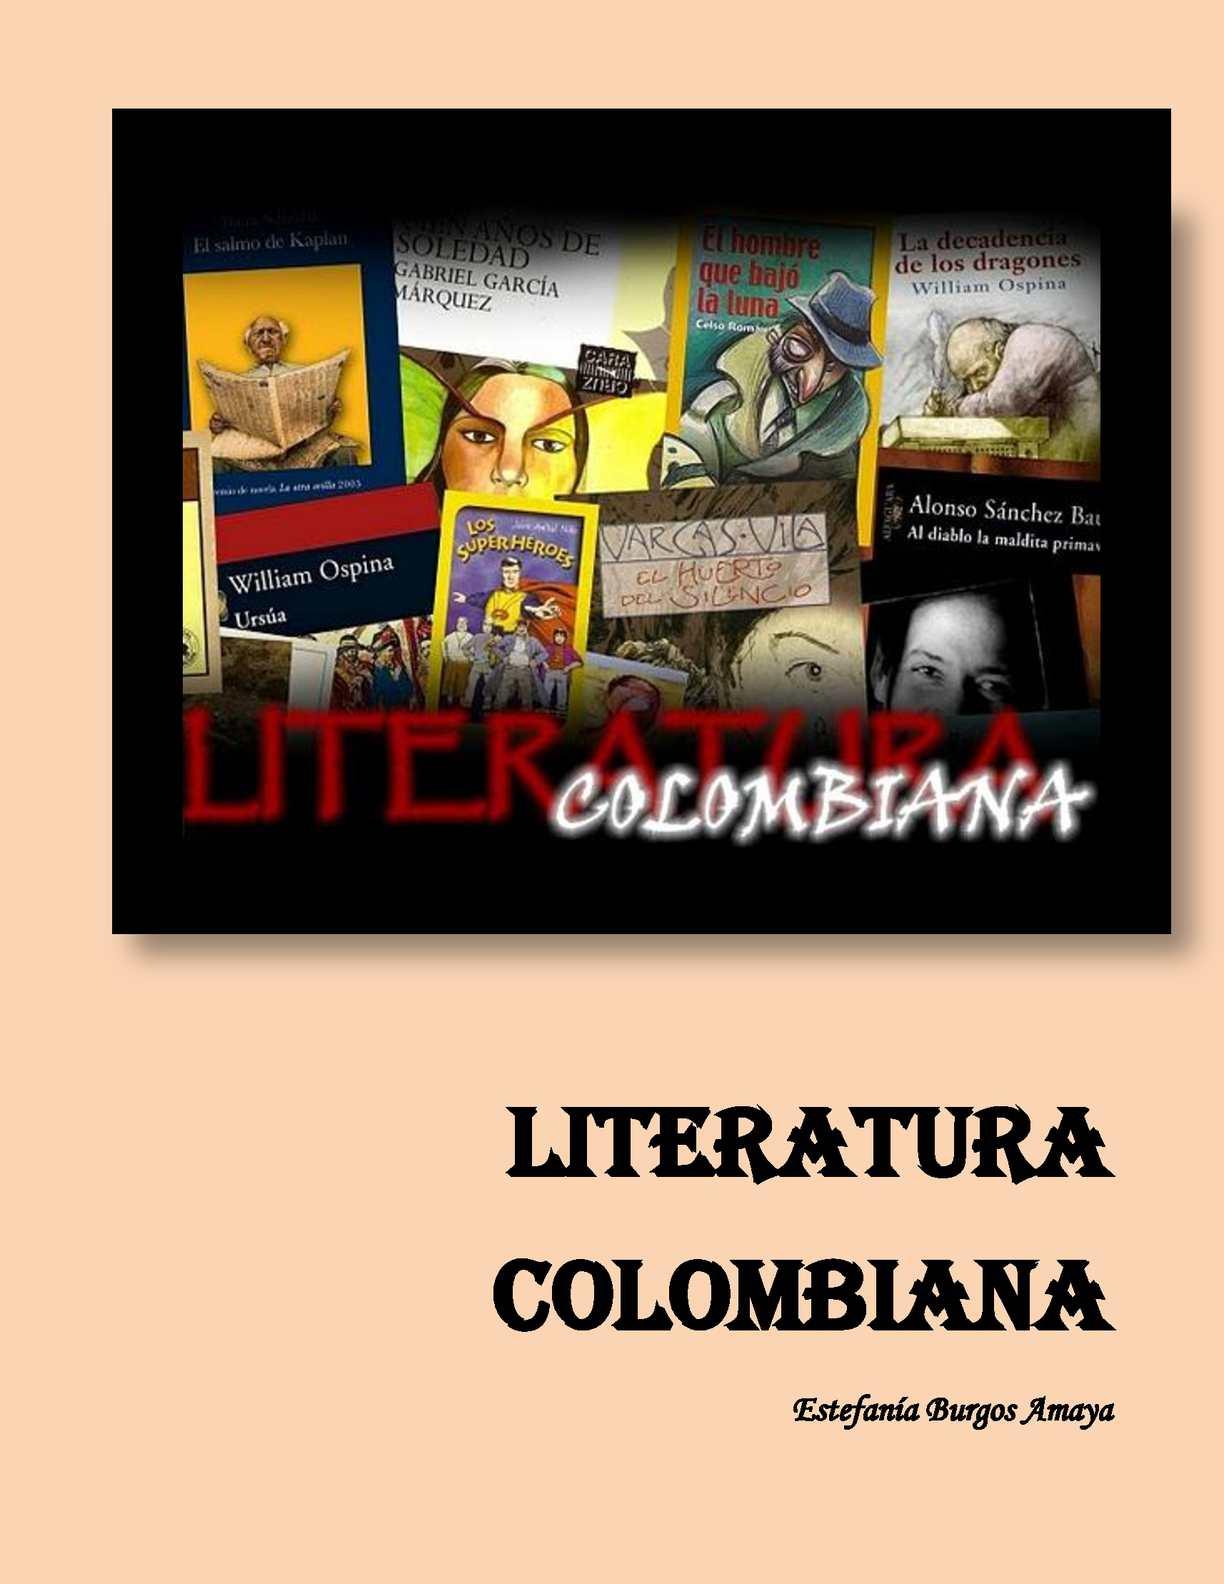 LITERATURA COLOMBIANA